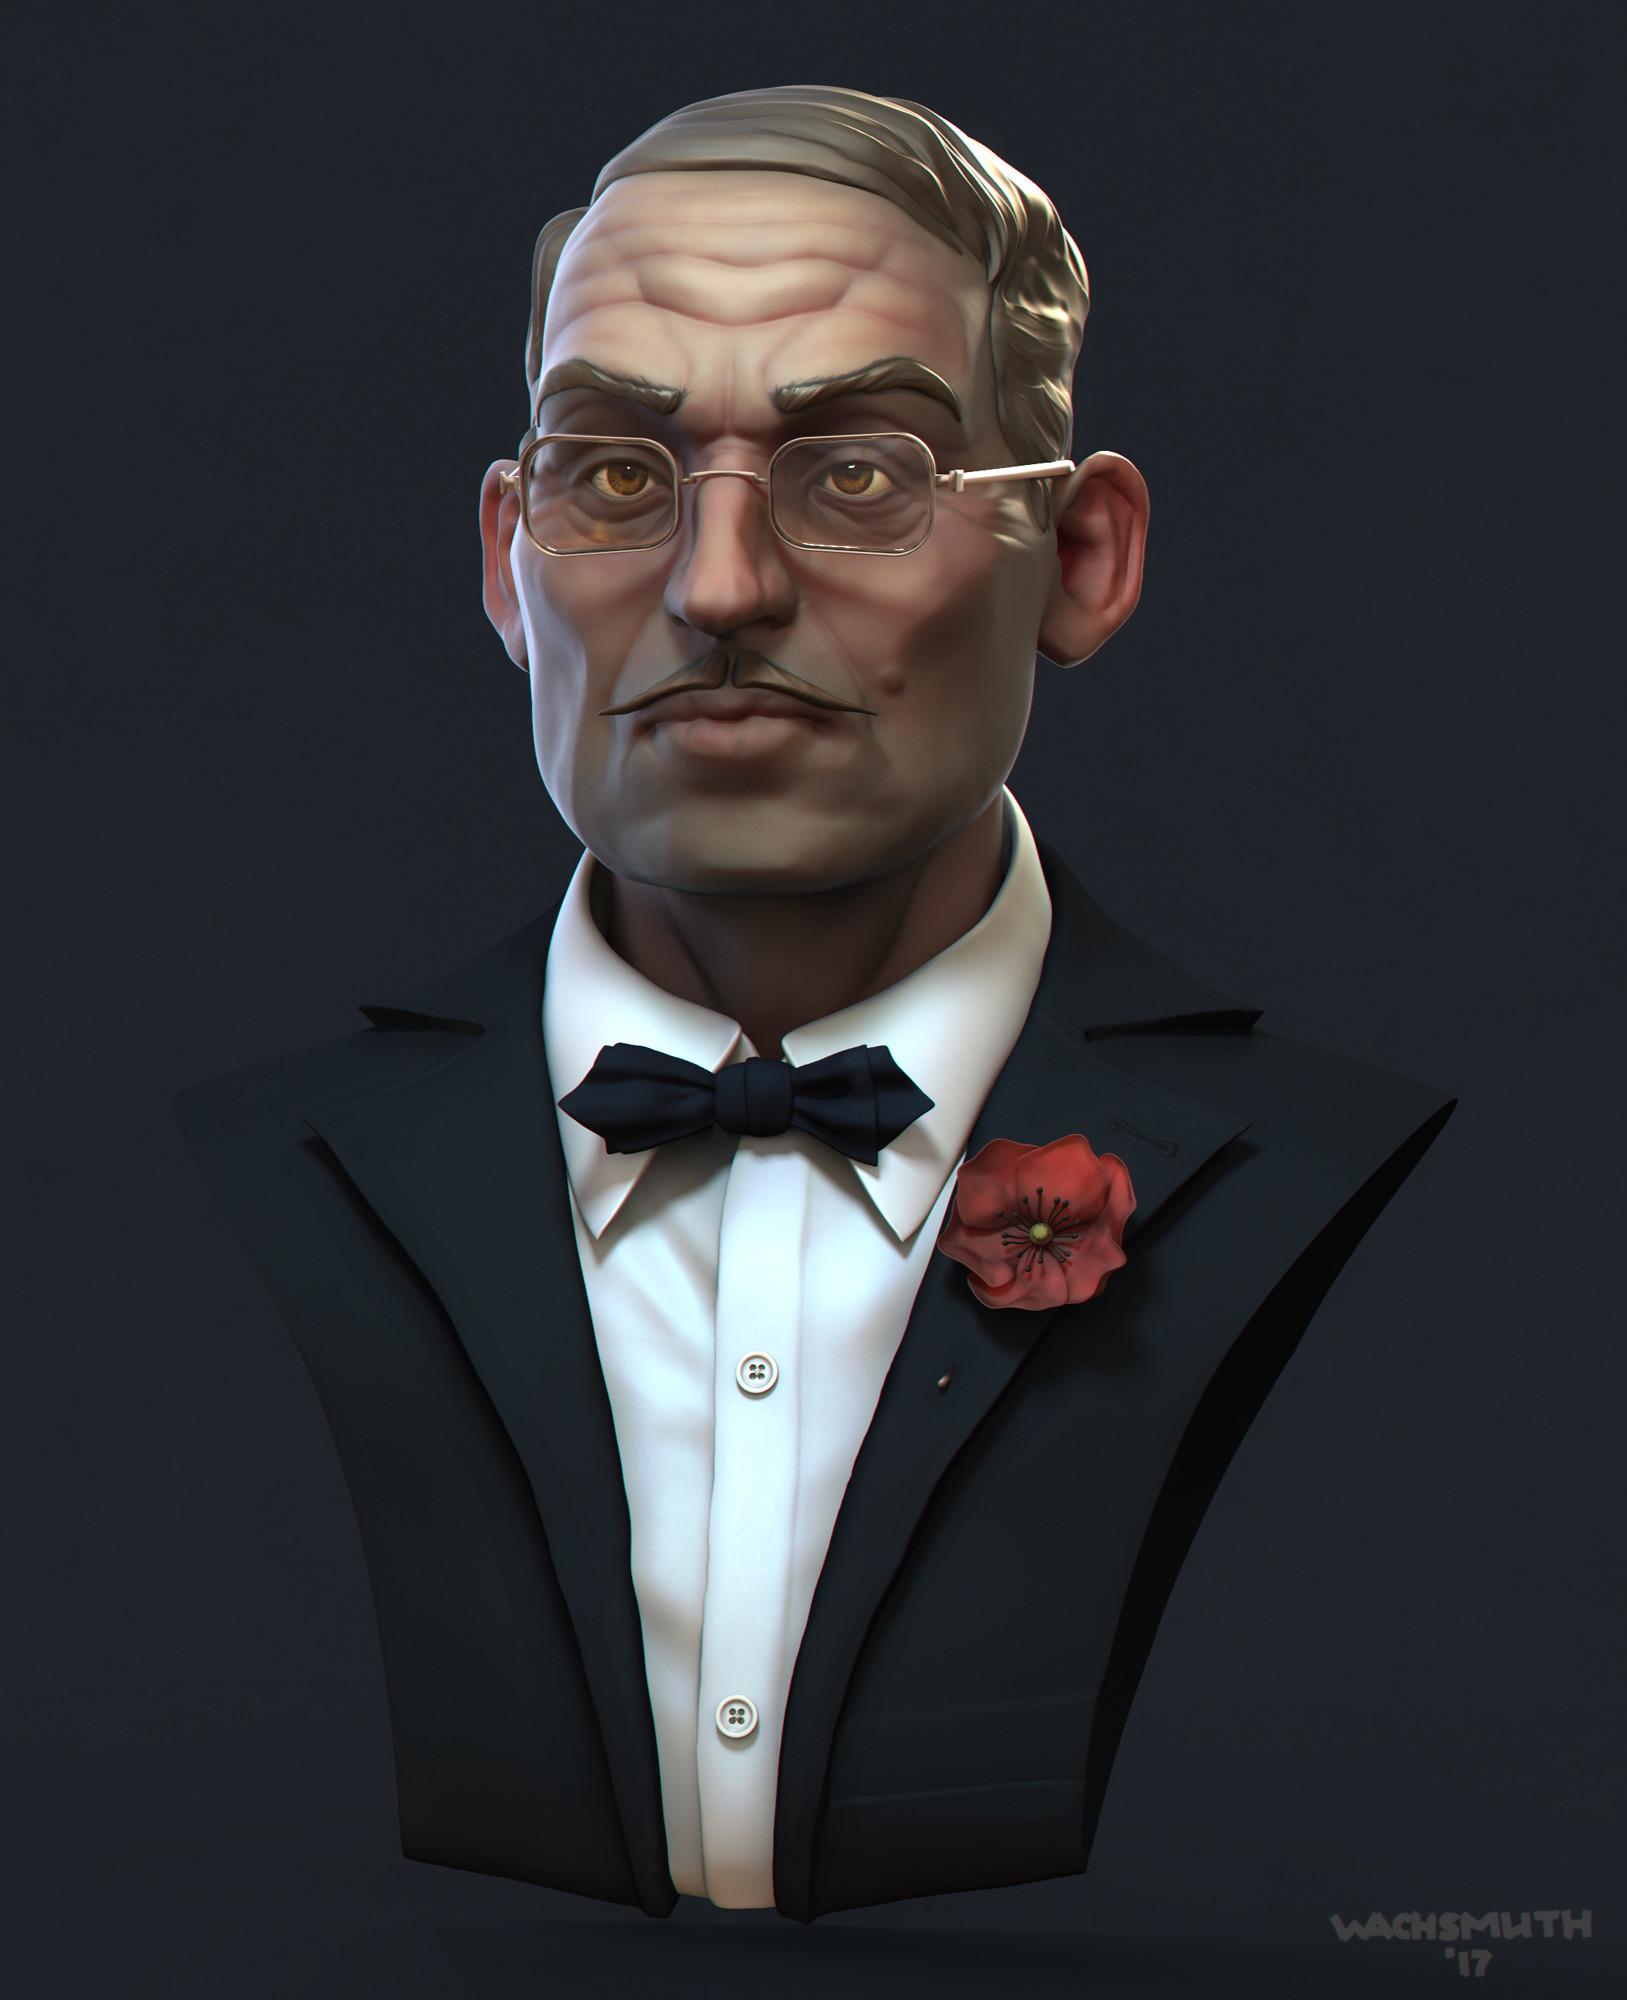 Dirk wachsmuth male portrait render 4web